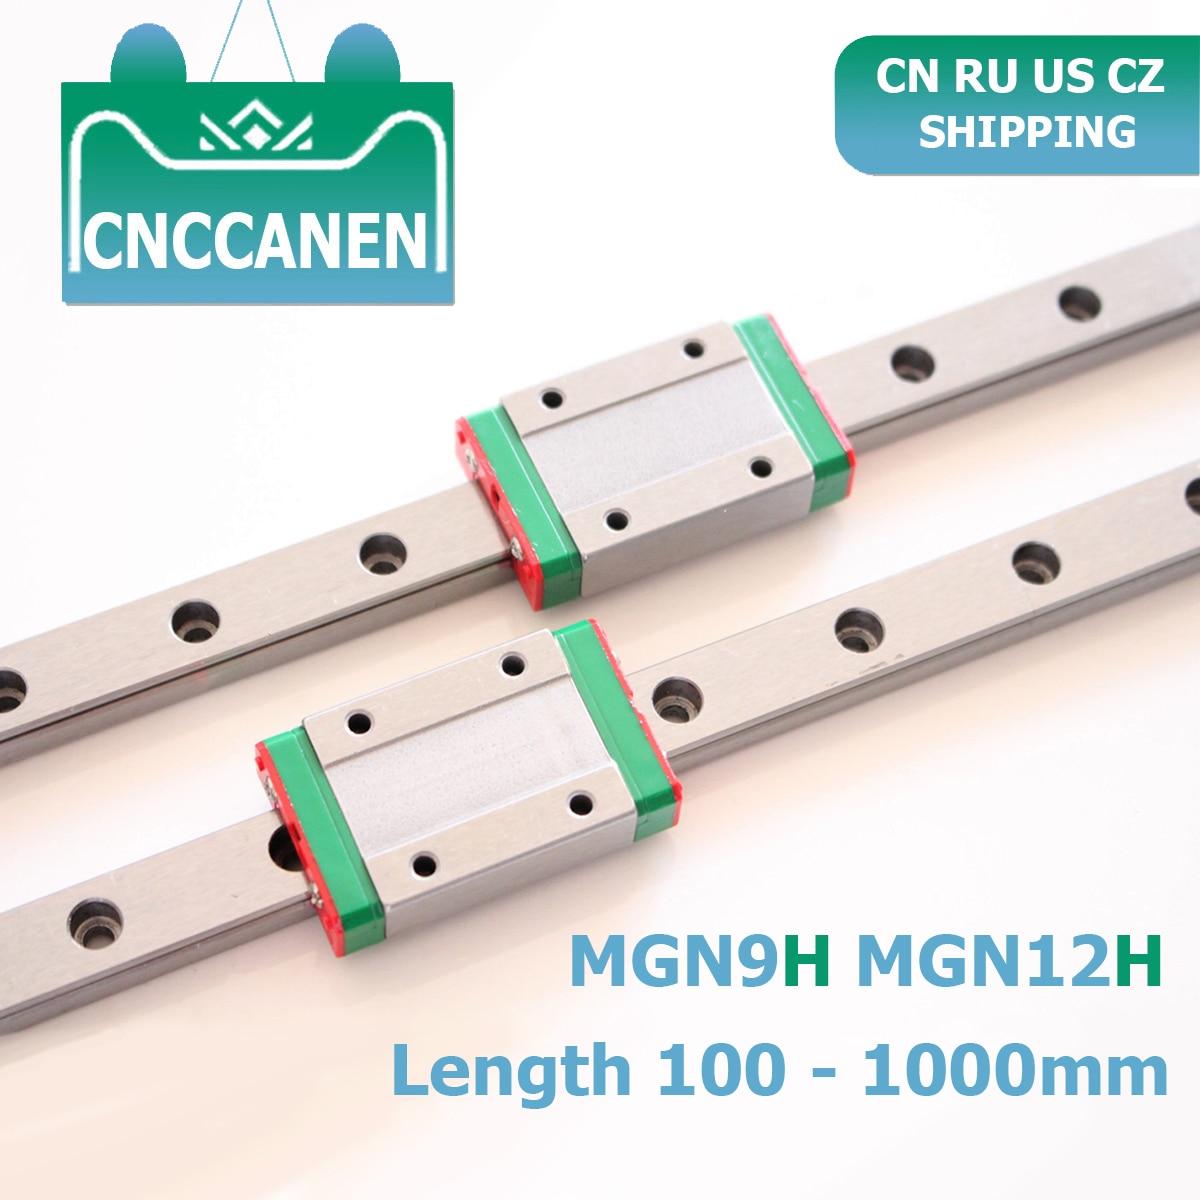 CNC Parts MGN9 MGN12 100 - 1000mm Miniature Linear Rail Slide 2PCS MGN Linear Guide + 2PCS MGN9H Or MGN12H Carriage 3D Printer